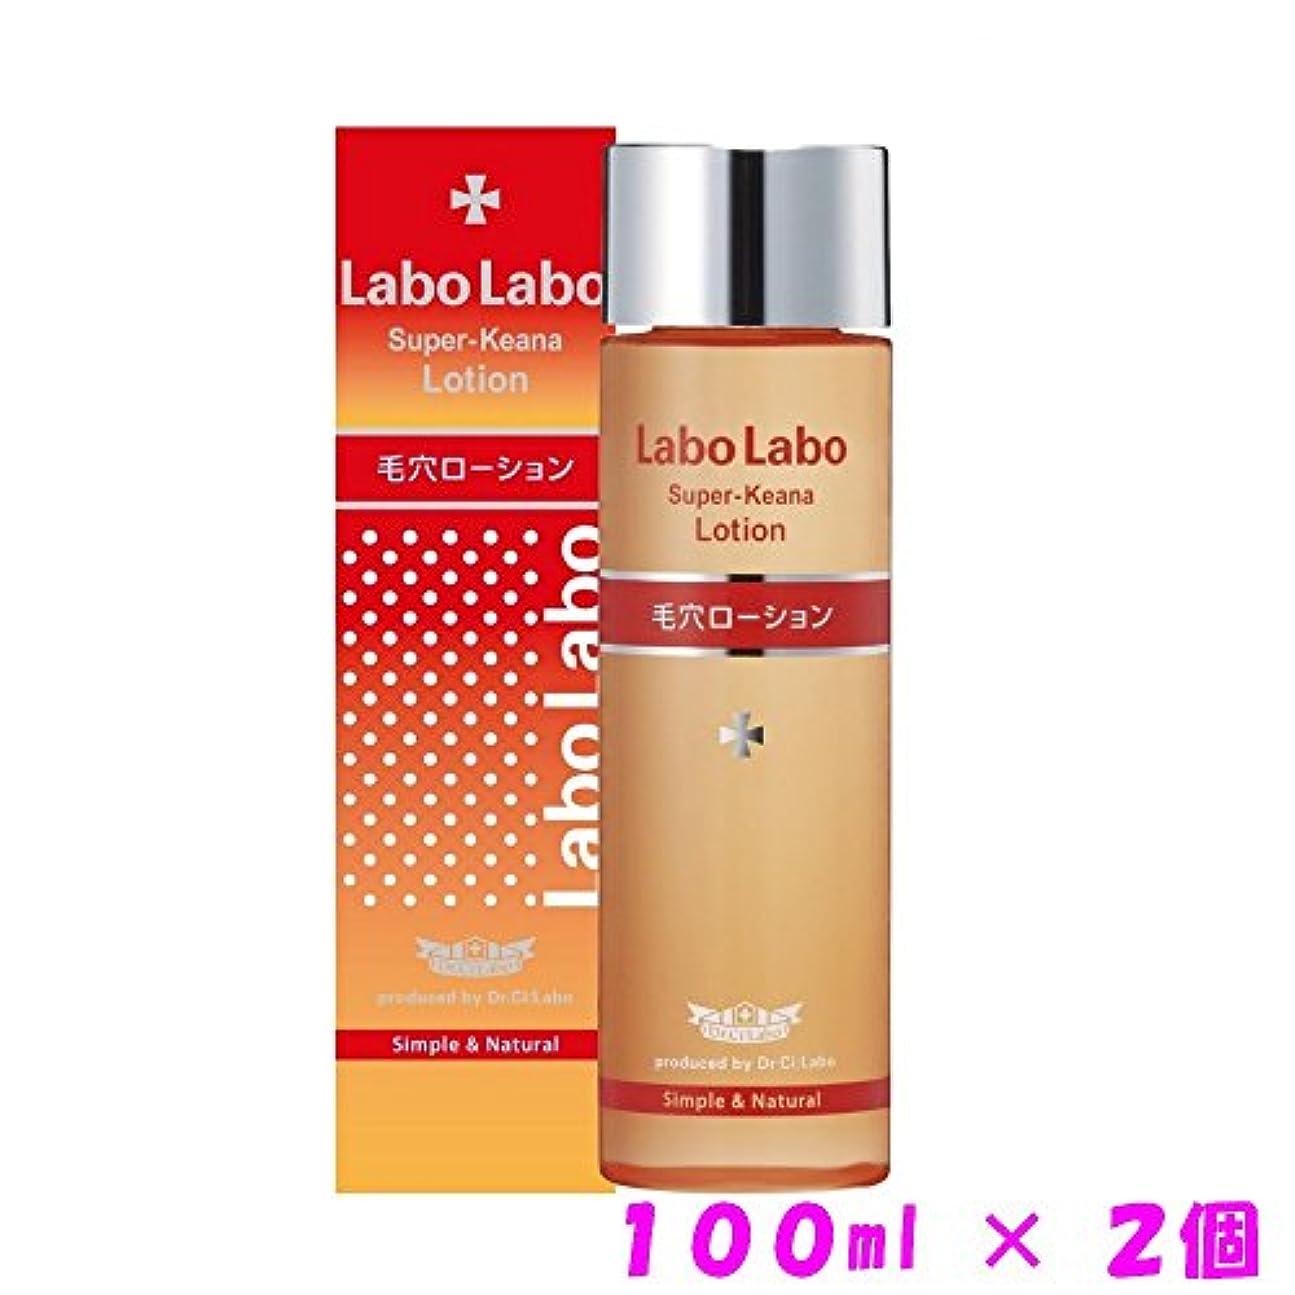 Labo Labo ラボラボ スーパー毛穴ローション(ふきとり化粧水)100ml×2